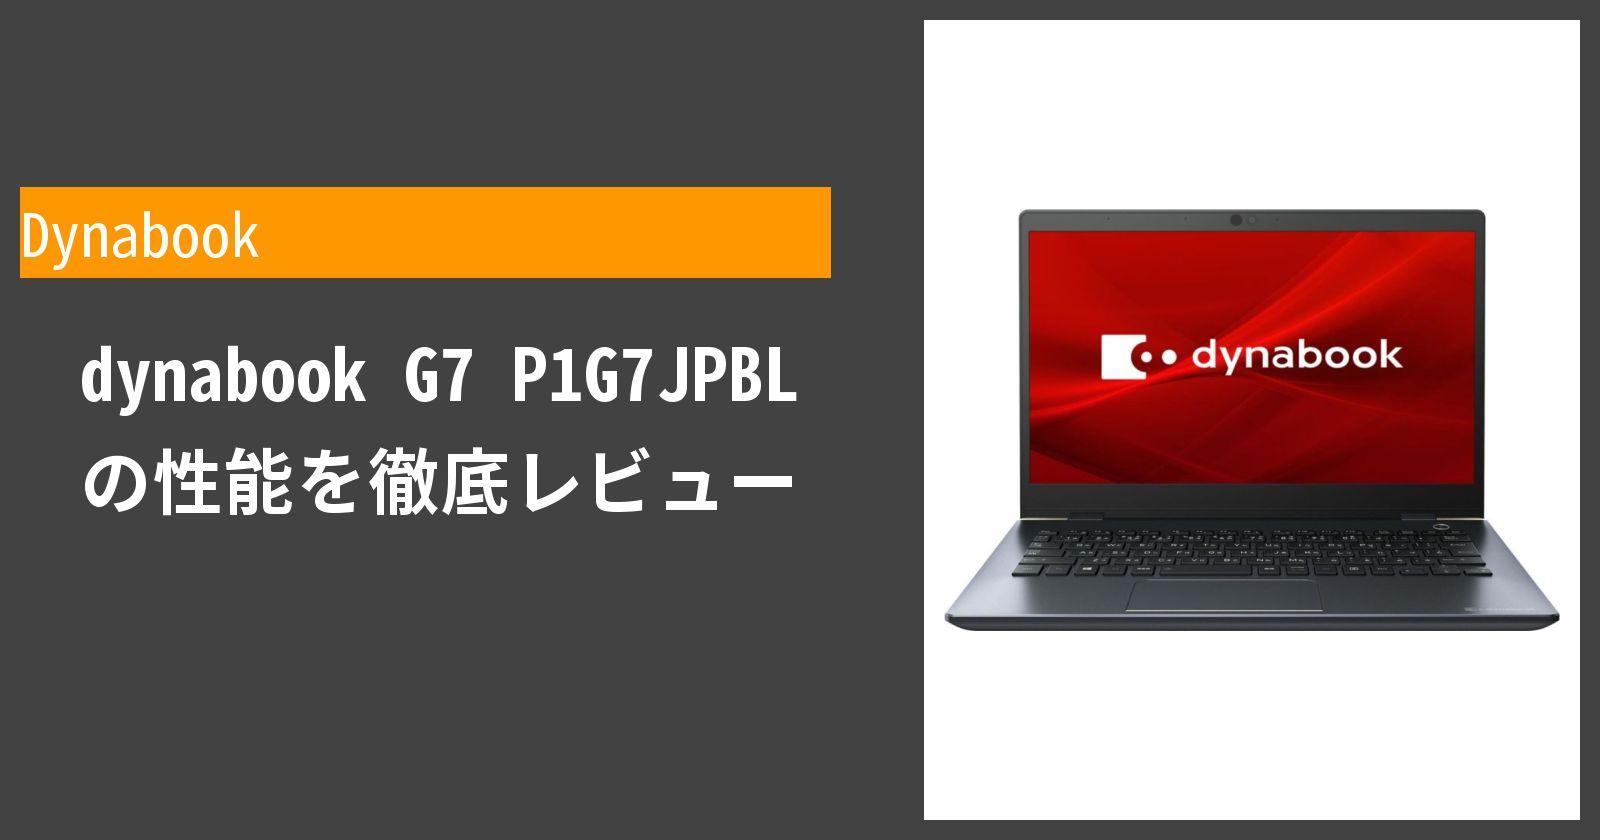 dynabook G7 P1G7JPBL の性能を徹底レビュー